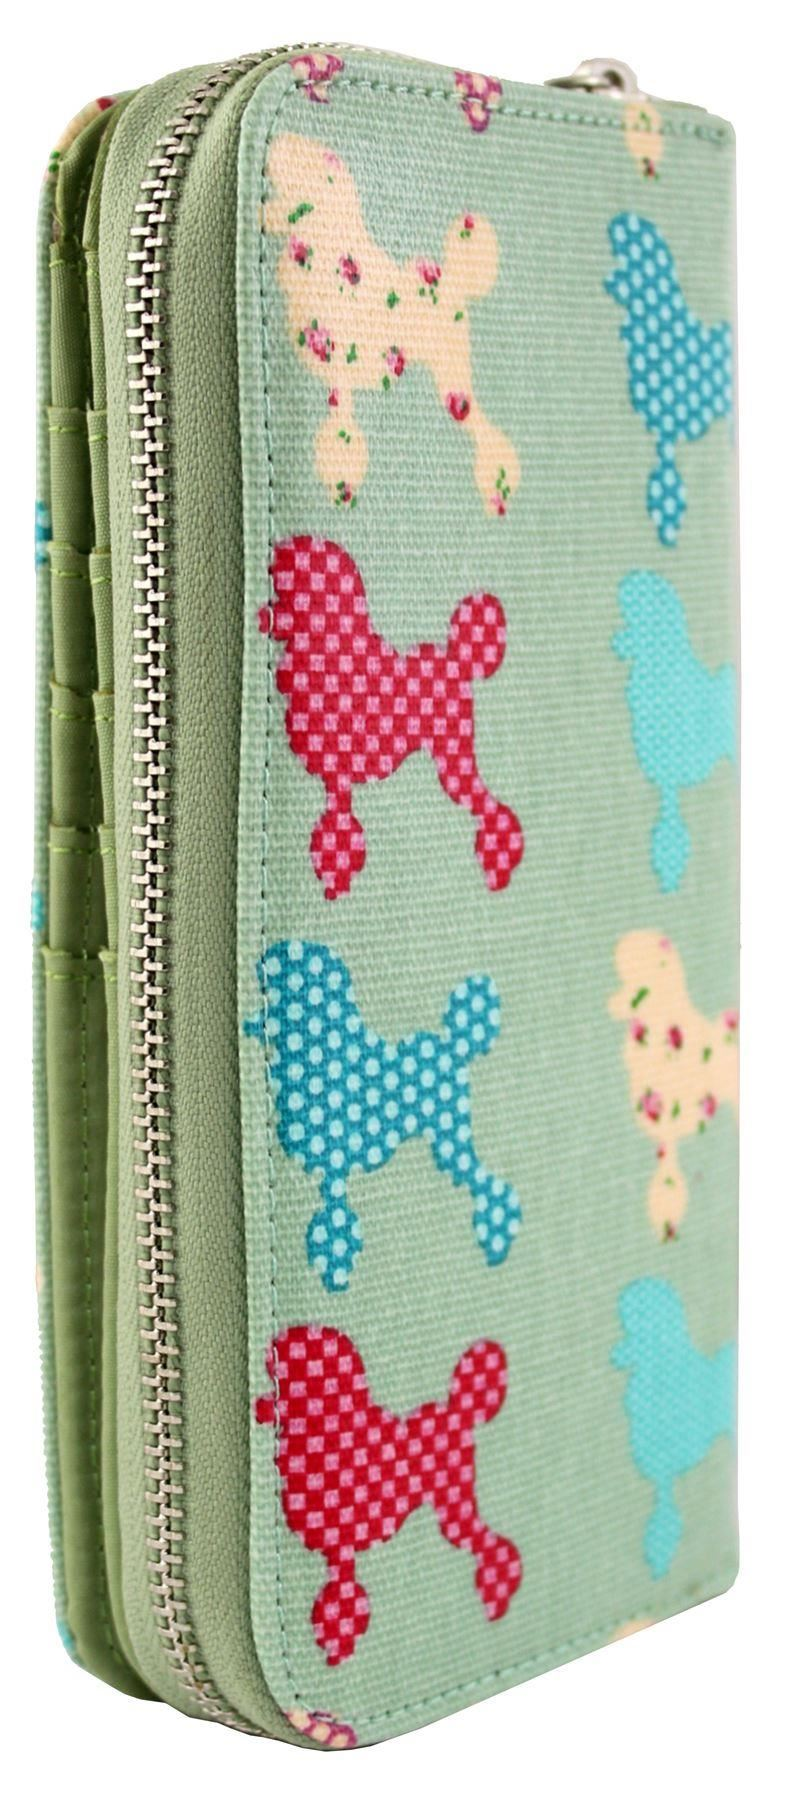 NUOVO Ragazze SIGNORE GRANDI CHIHUAHUA Poodle PATTERN Wallet Purse